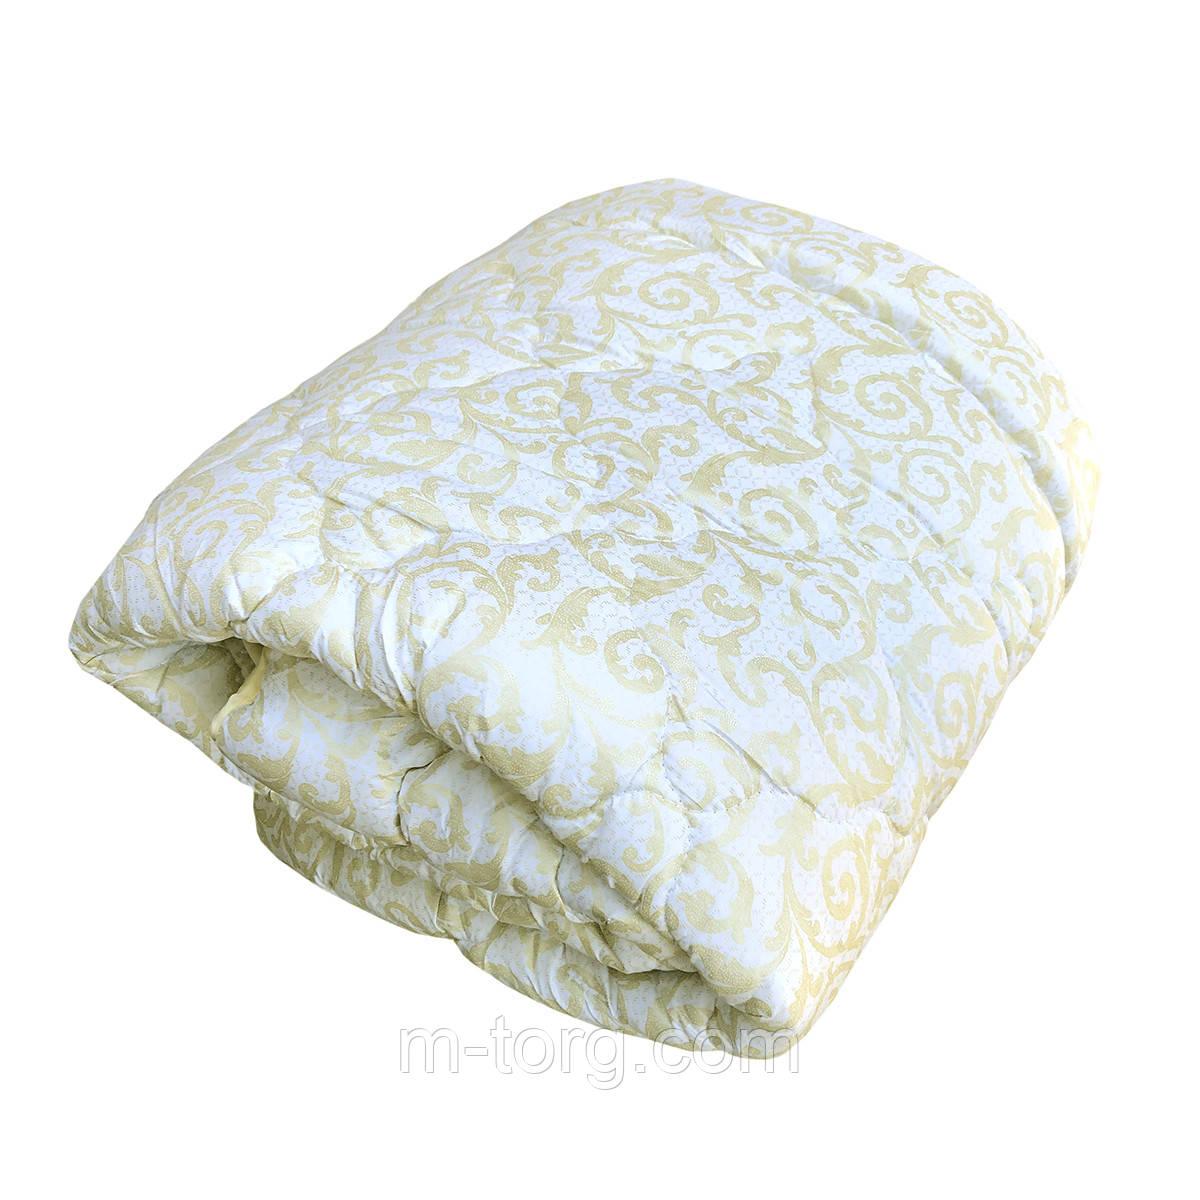 Одеяло евро размер 200/220 холлофайбер, ткань микрофибра